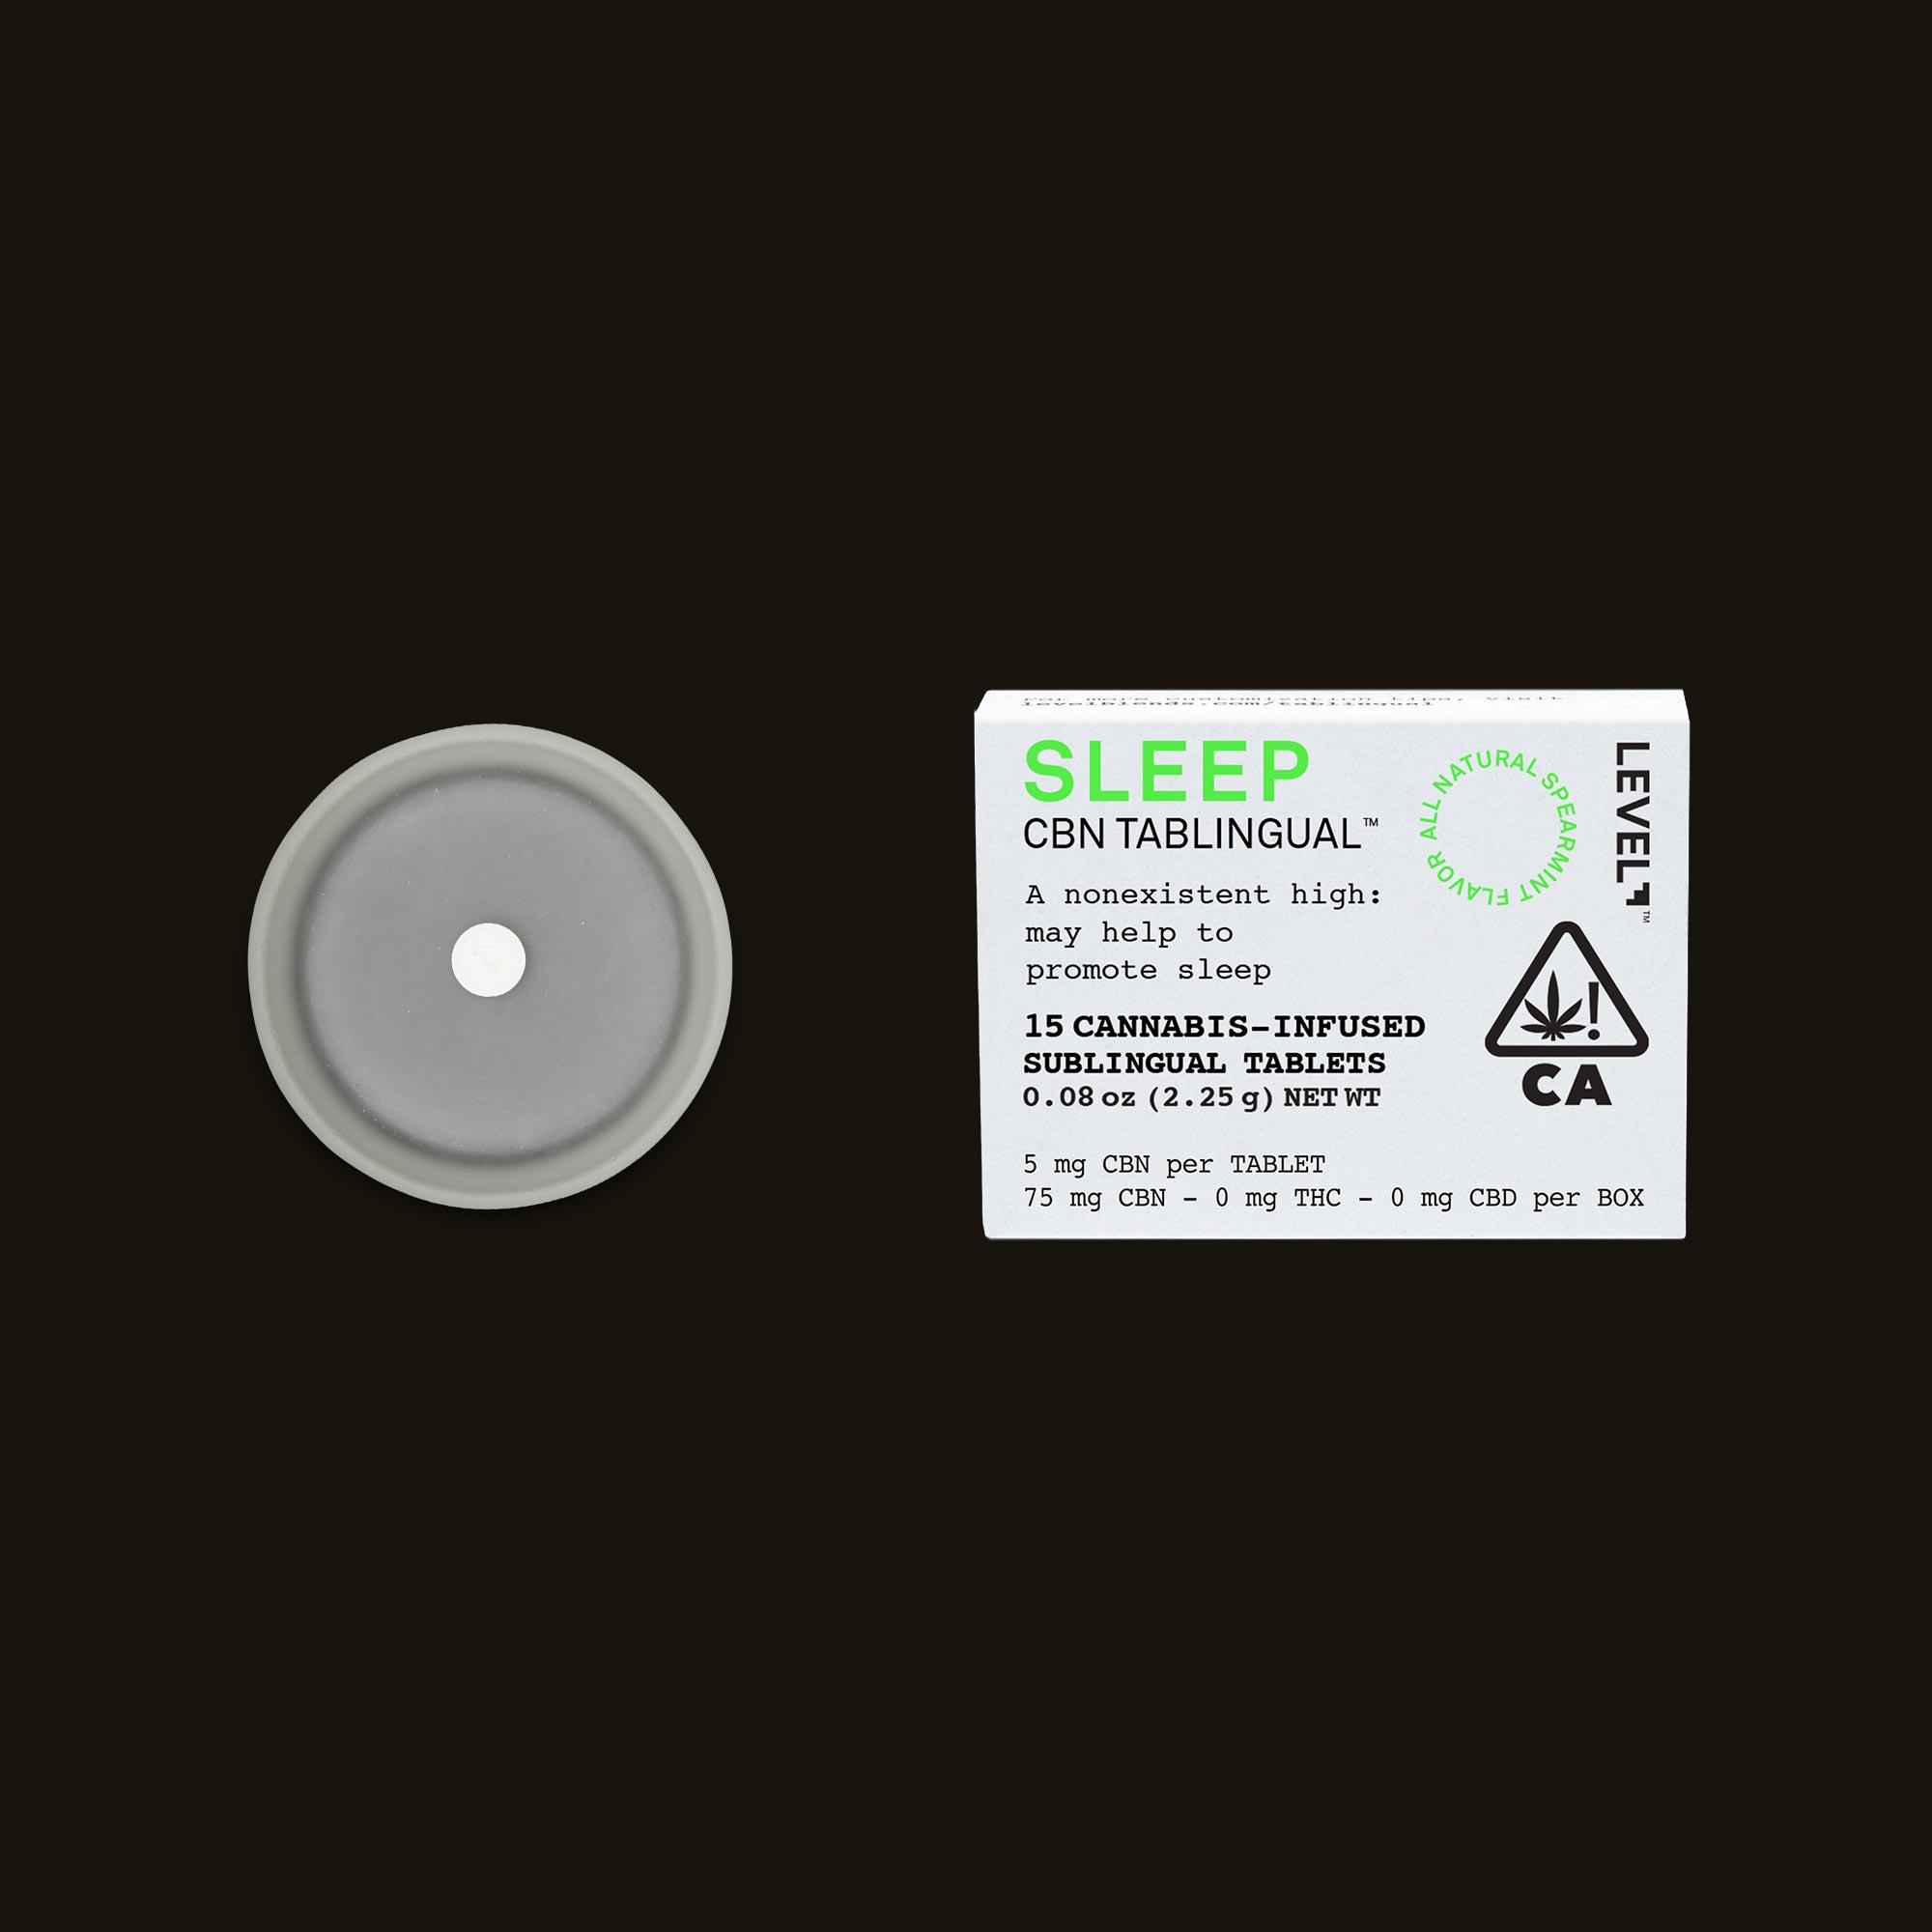 Sleep Tablingual by LEVEL